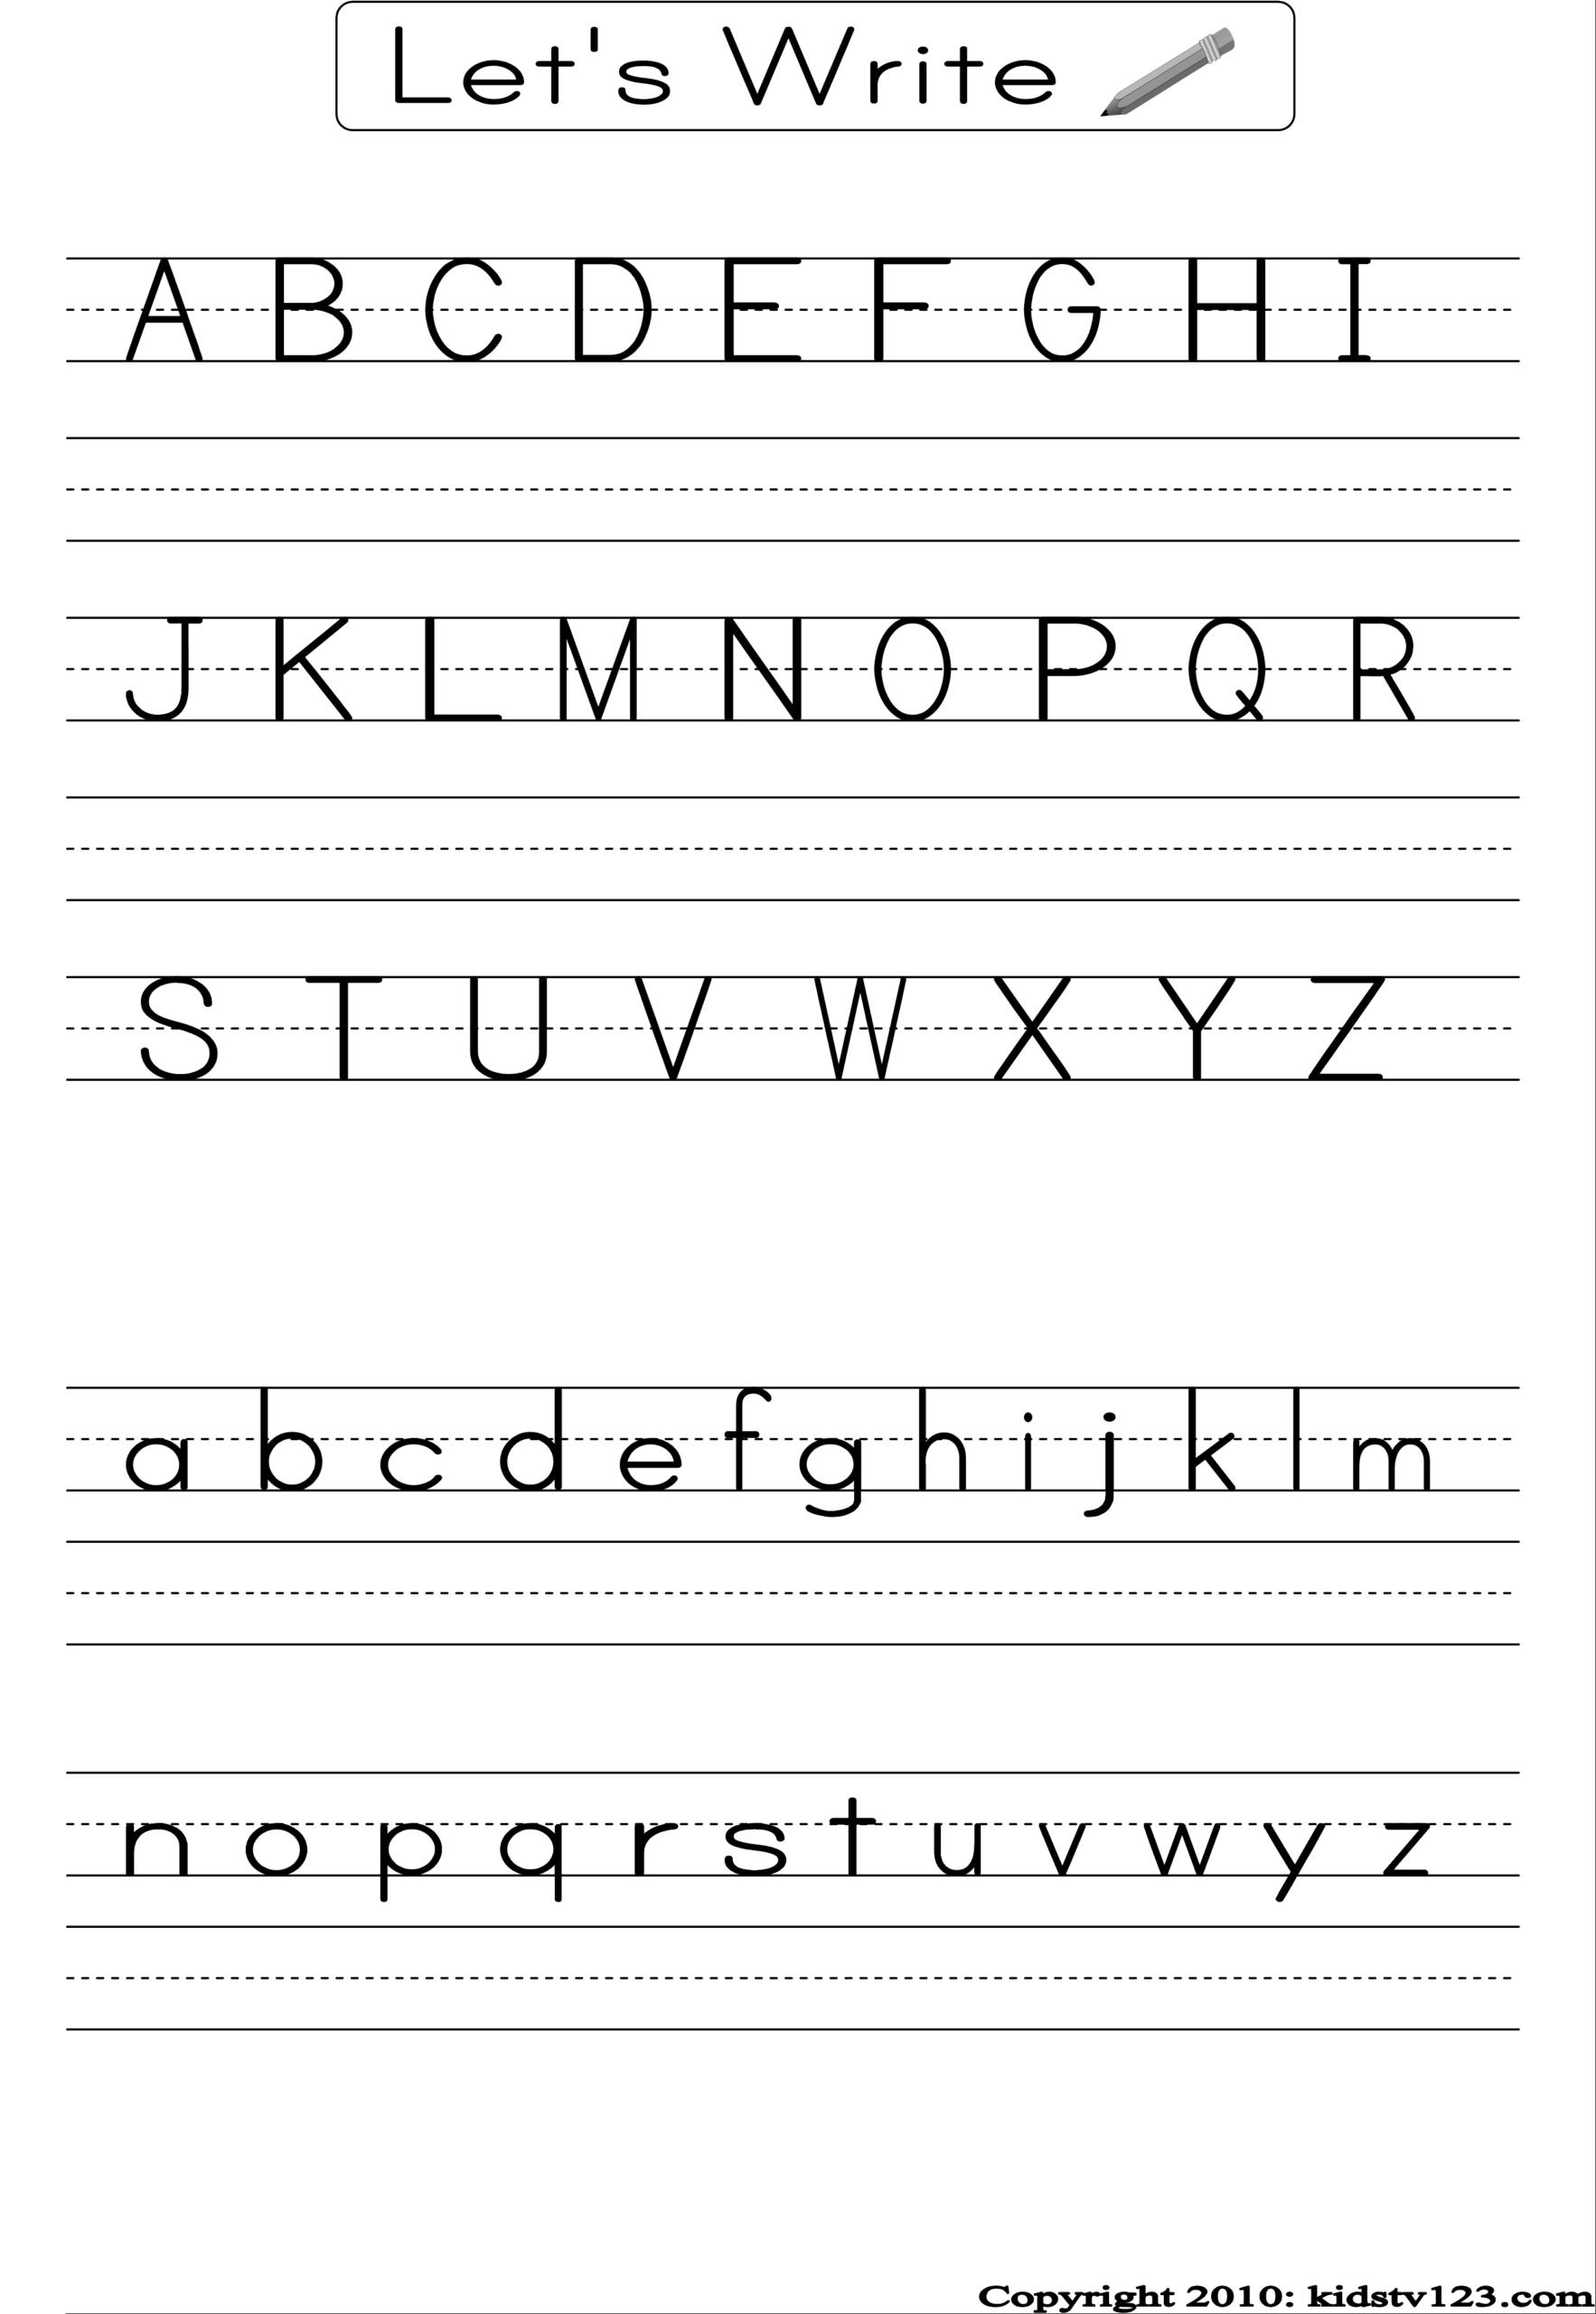 Alphabet Writing Practice Sheet | Alphabet Writing Practice for Alphabet Worksheets For Preschoolers Printable